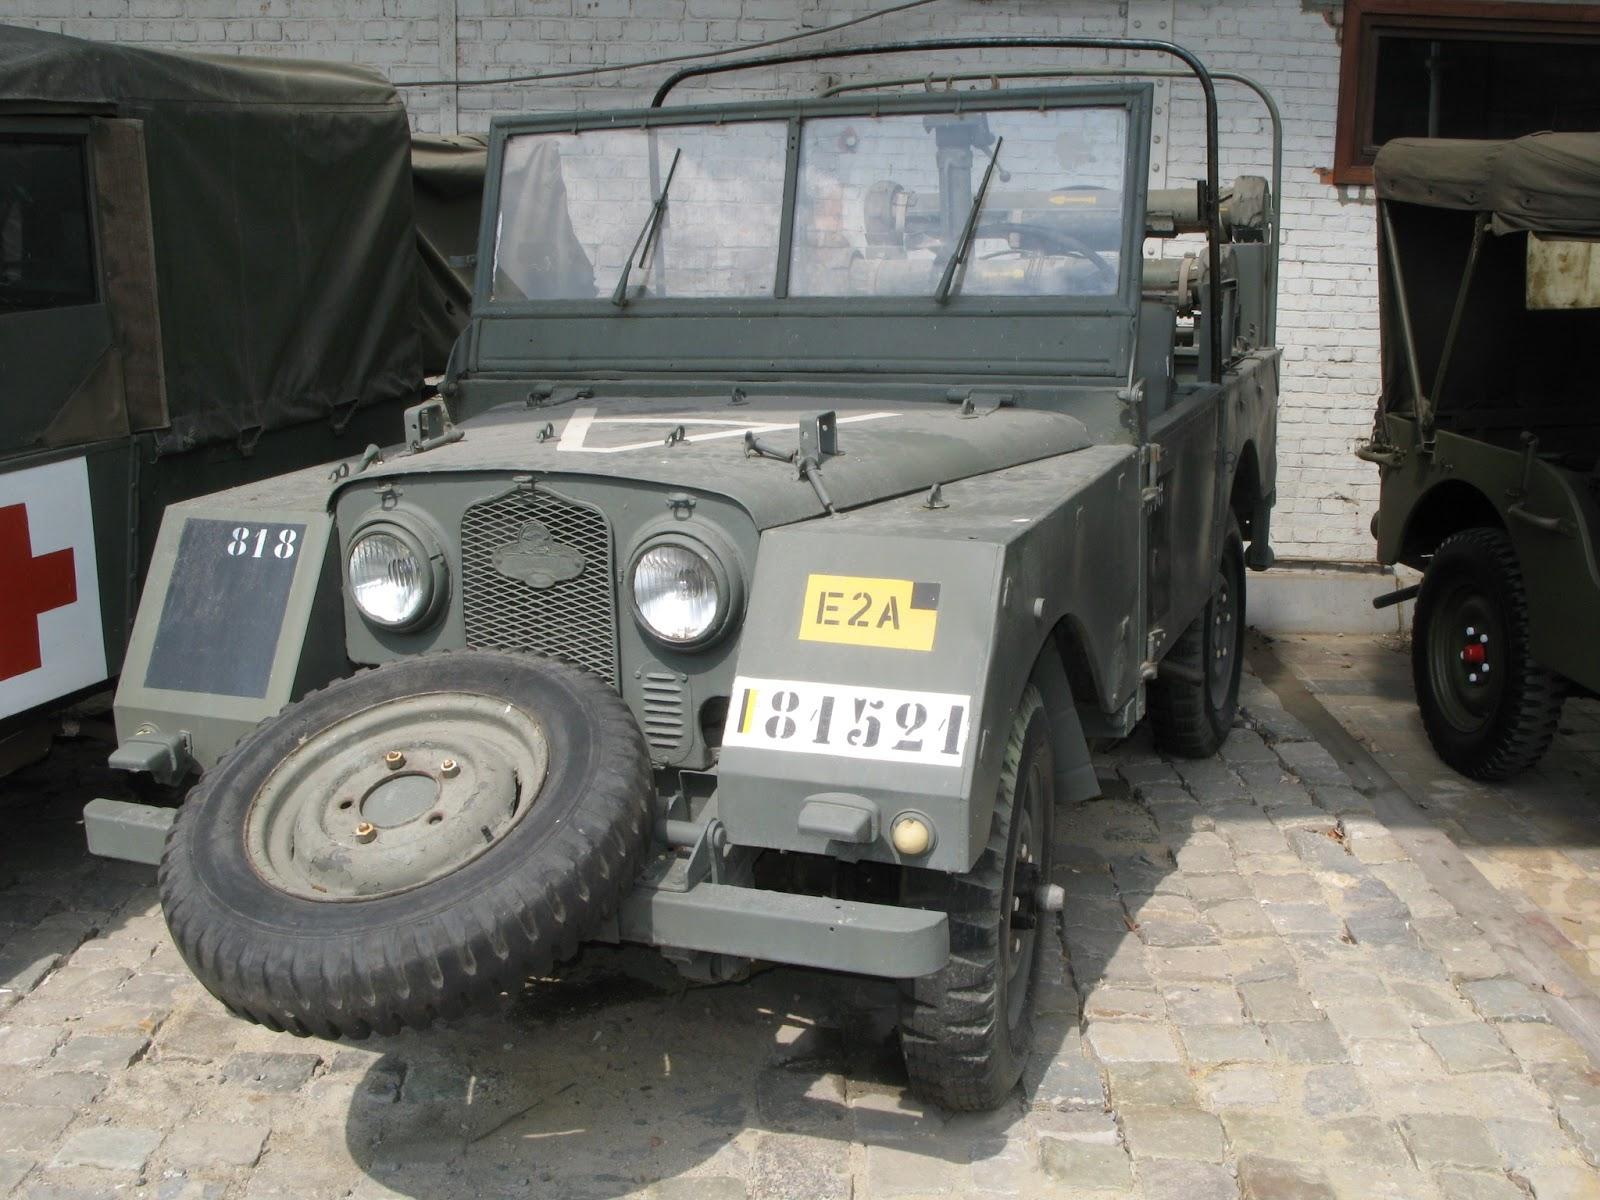 sas pink tamiya sale for rover products british land landrover panther